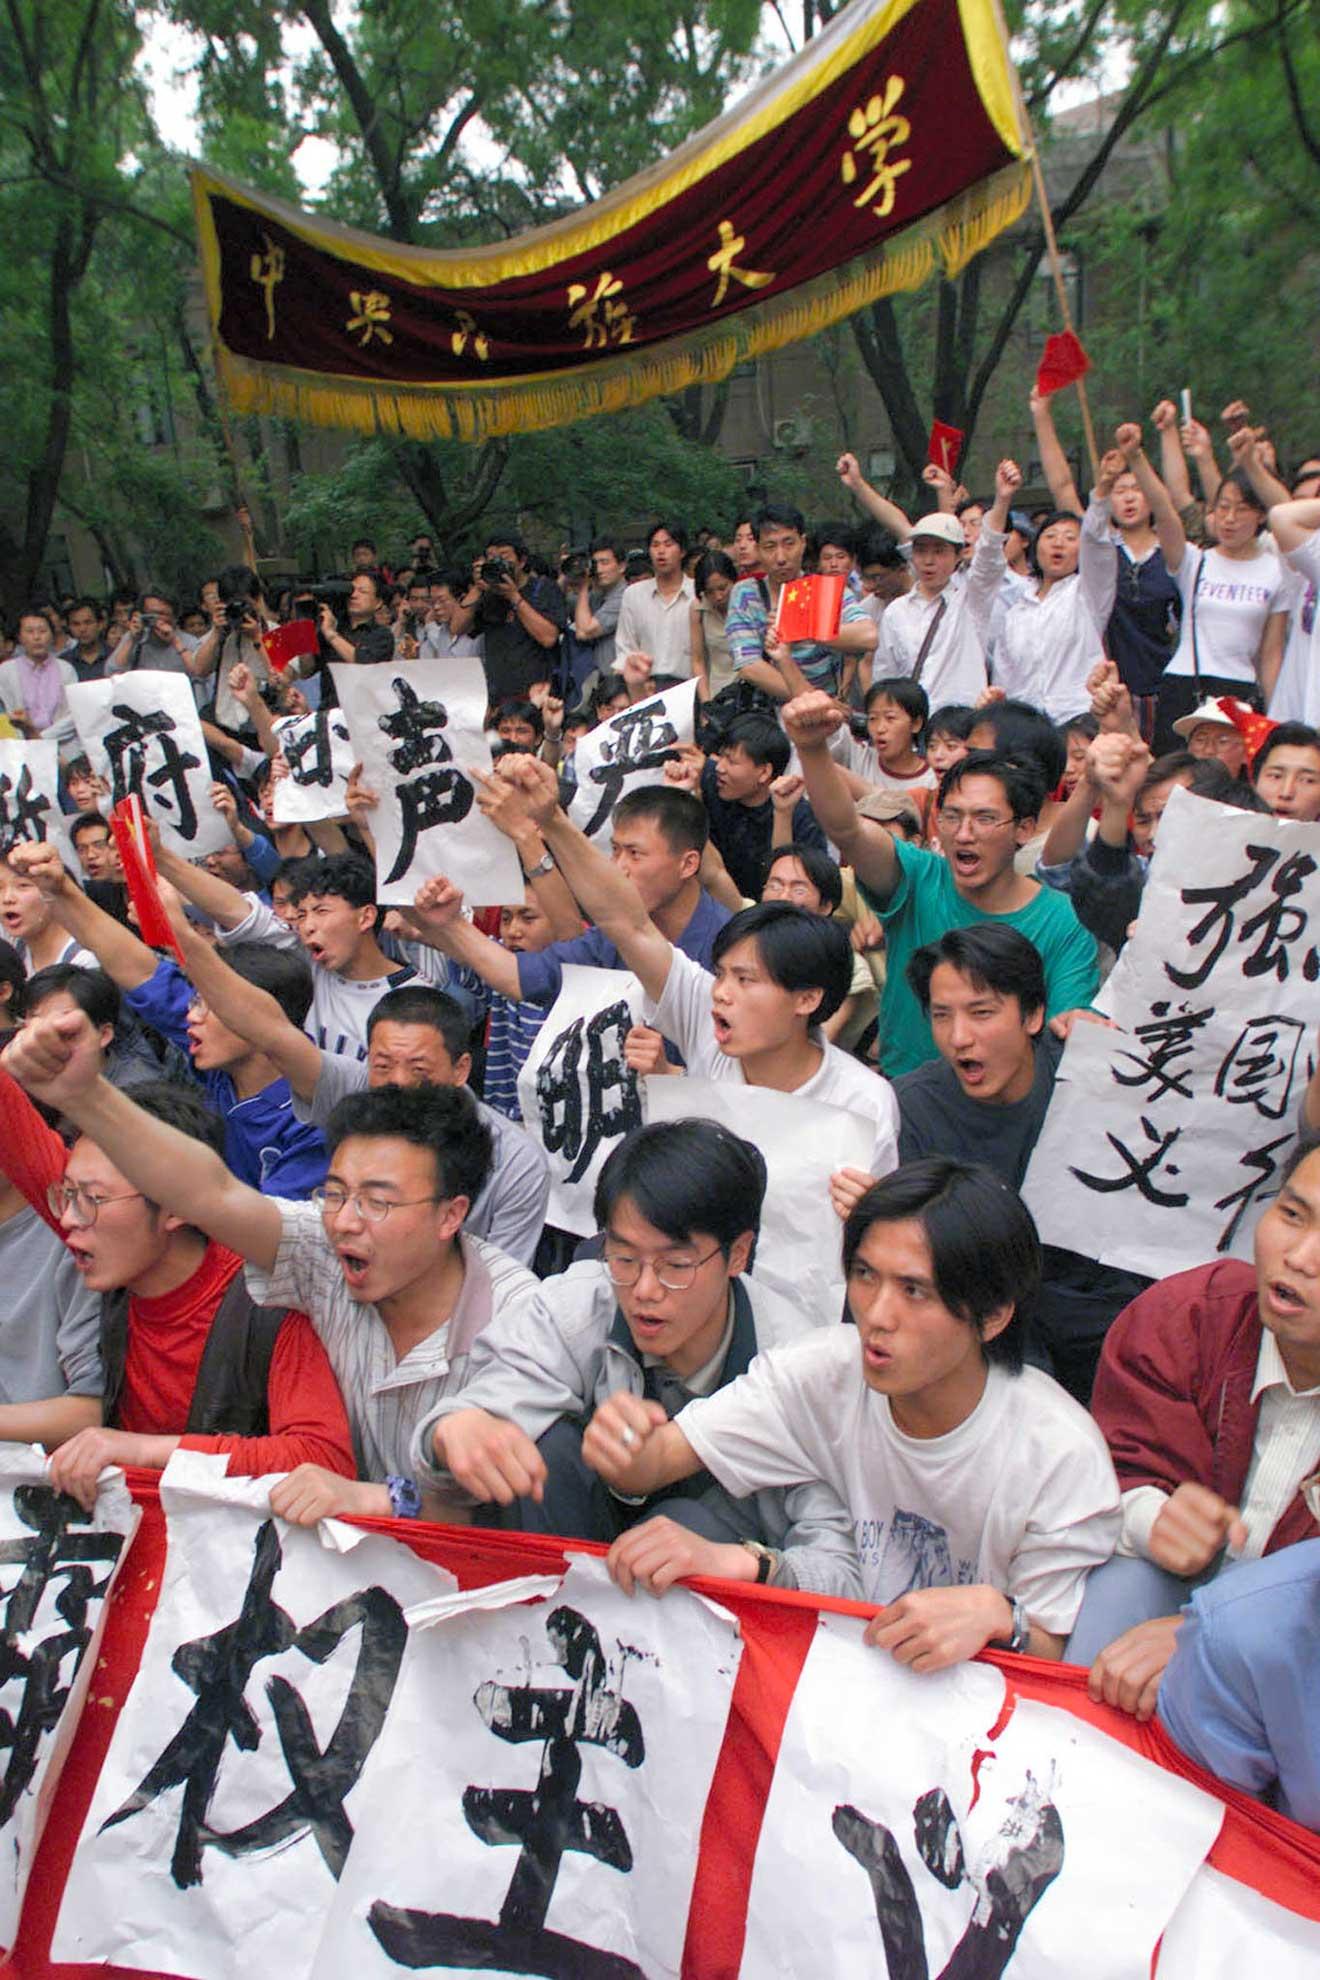 1999年|駐ユーゴ中国大使館誤爆事件